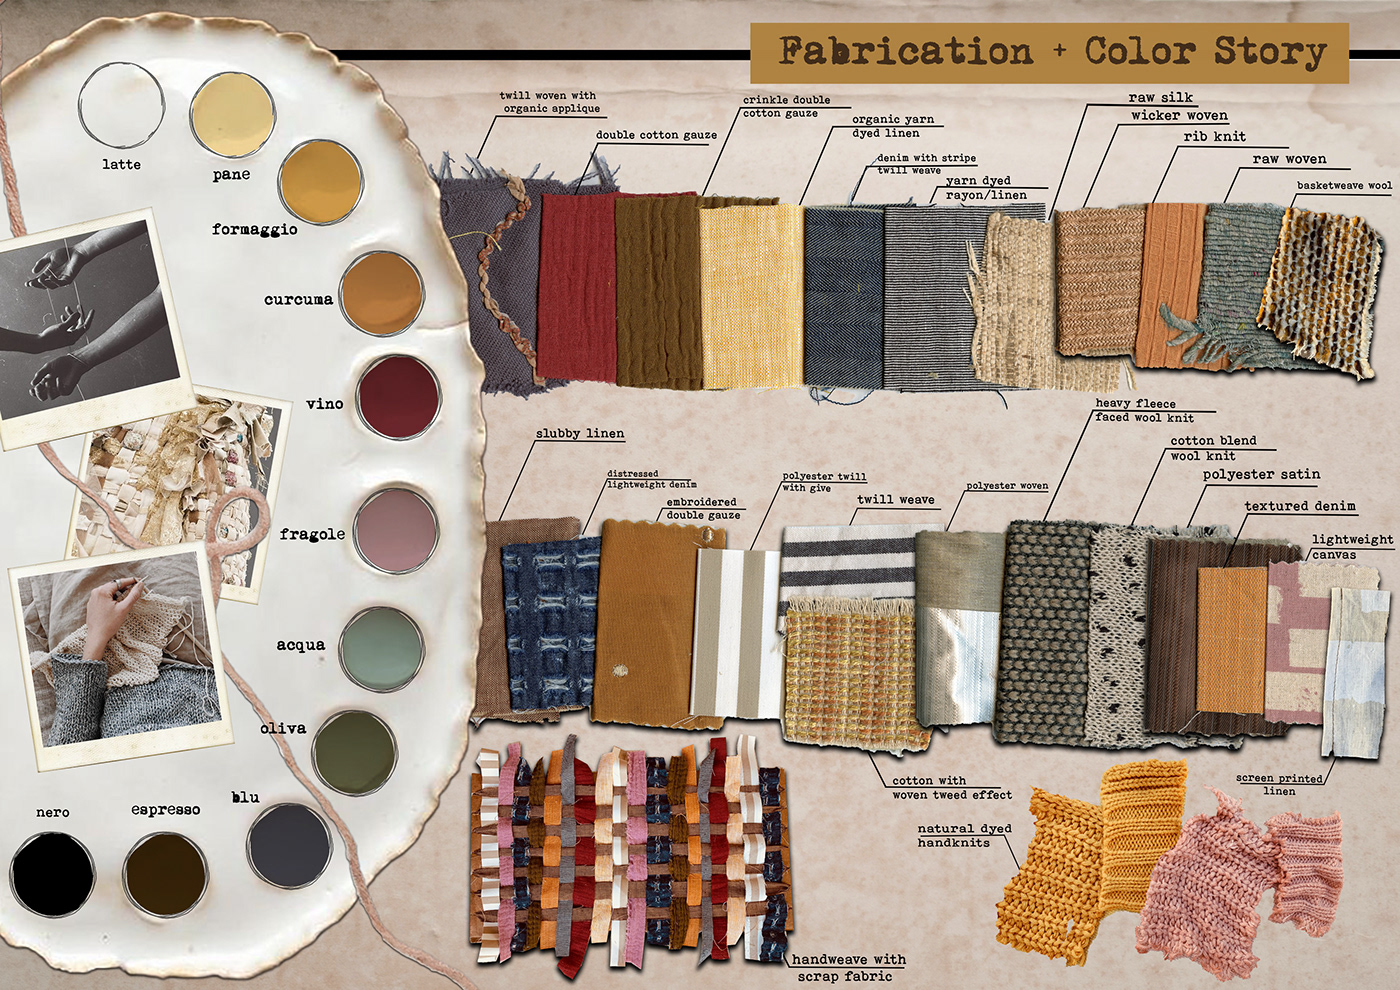 concept development Fabric Board fashion design fashion illustration Hand weaving Illustrator Natural Dying photoshop SLOW FASHION technical flats